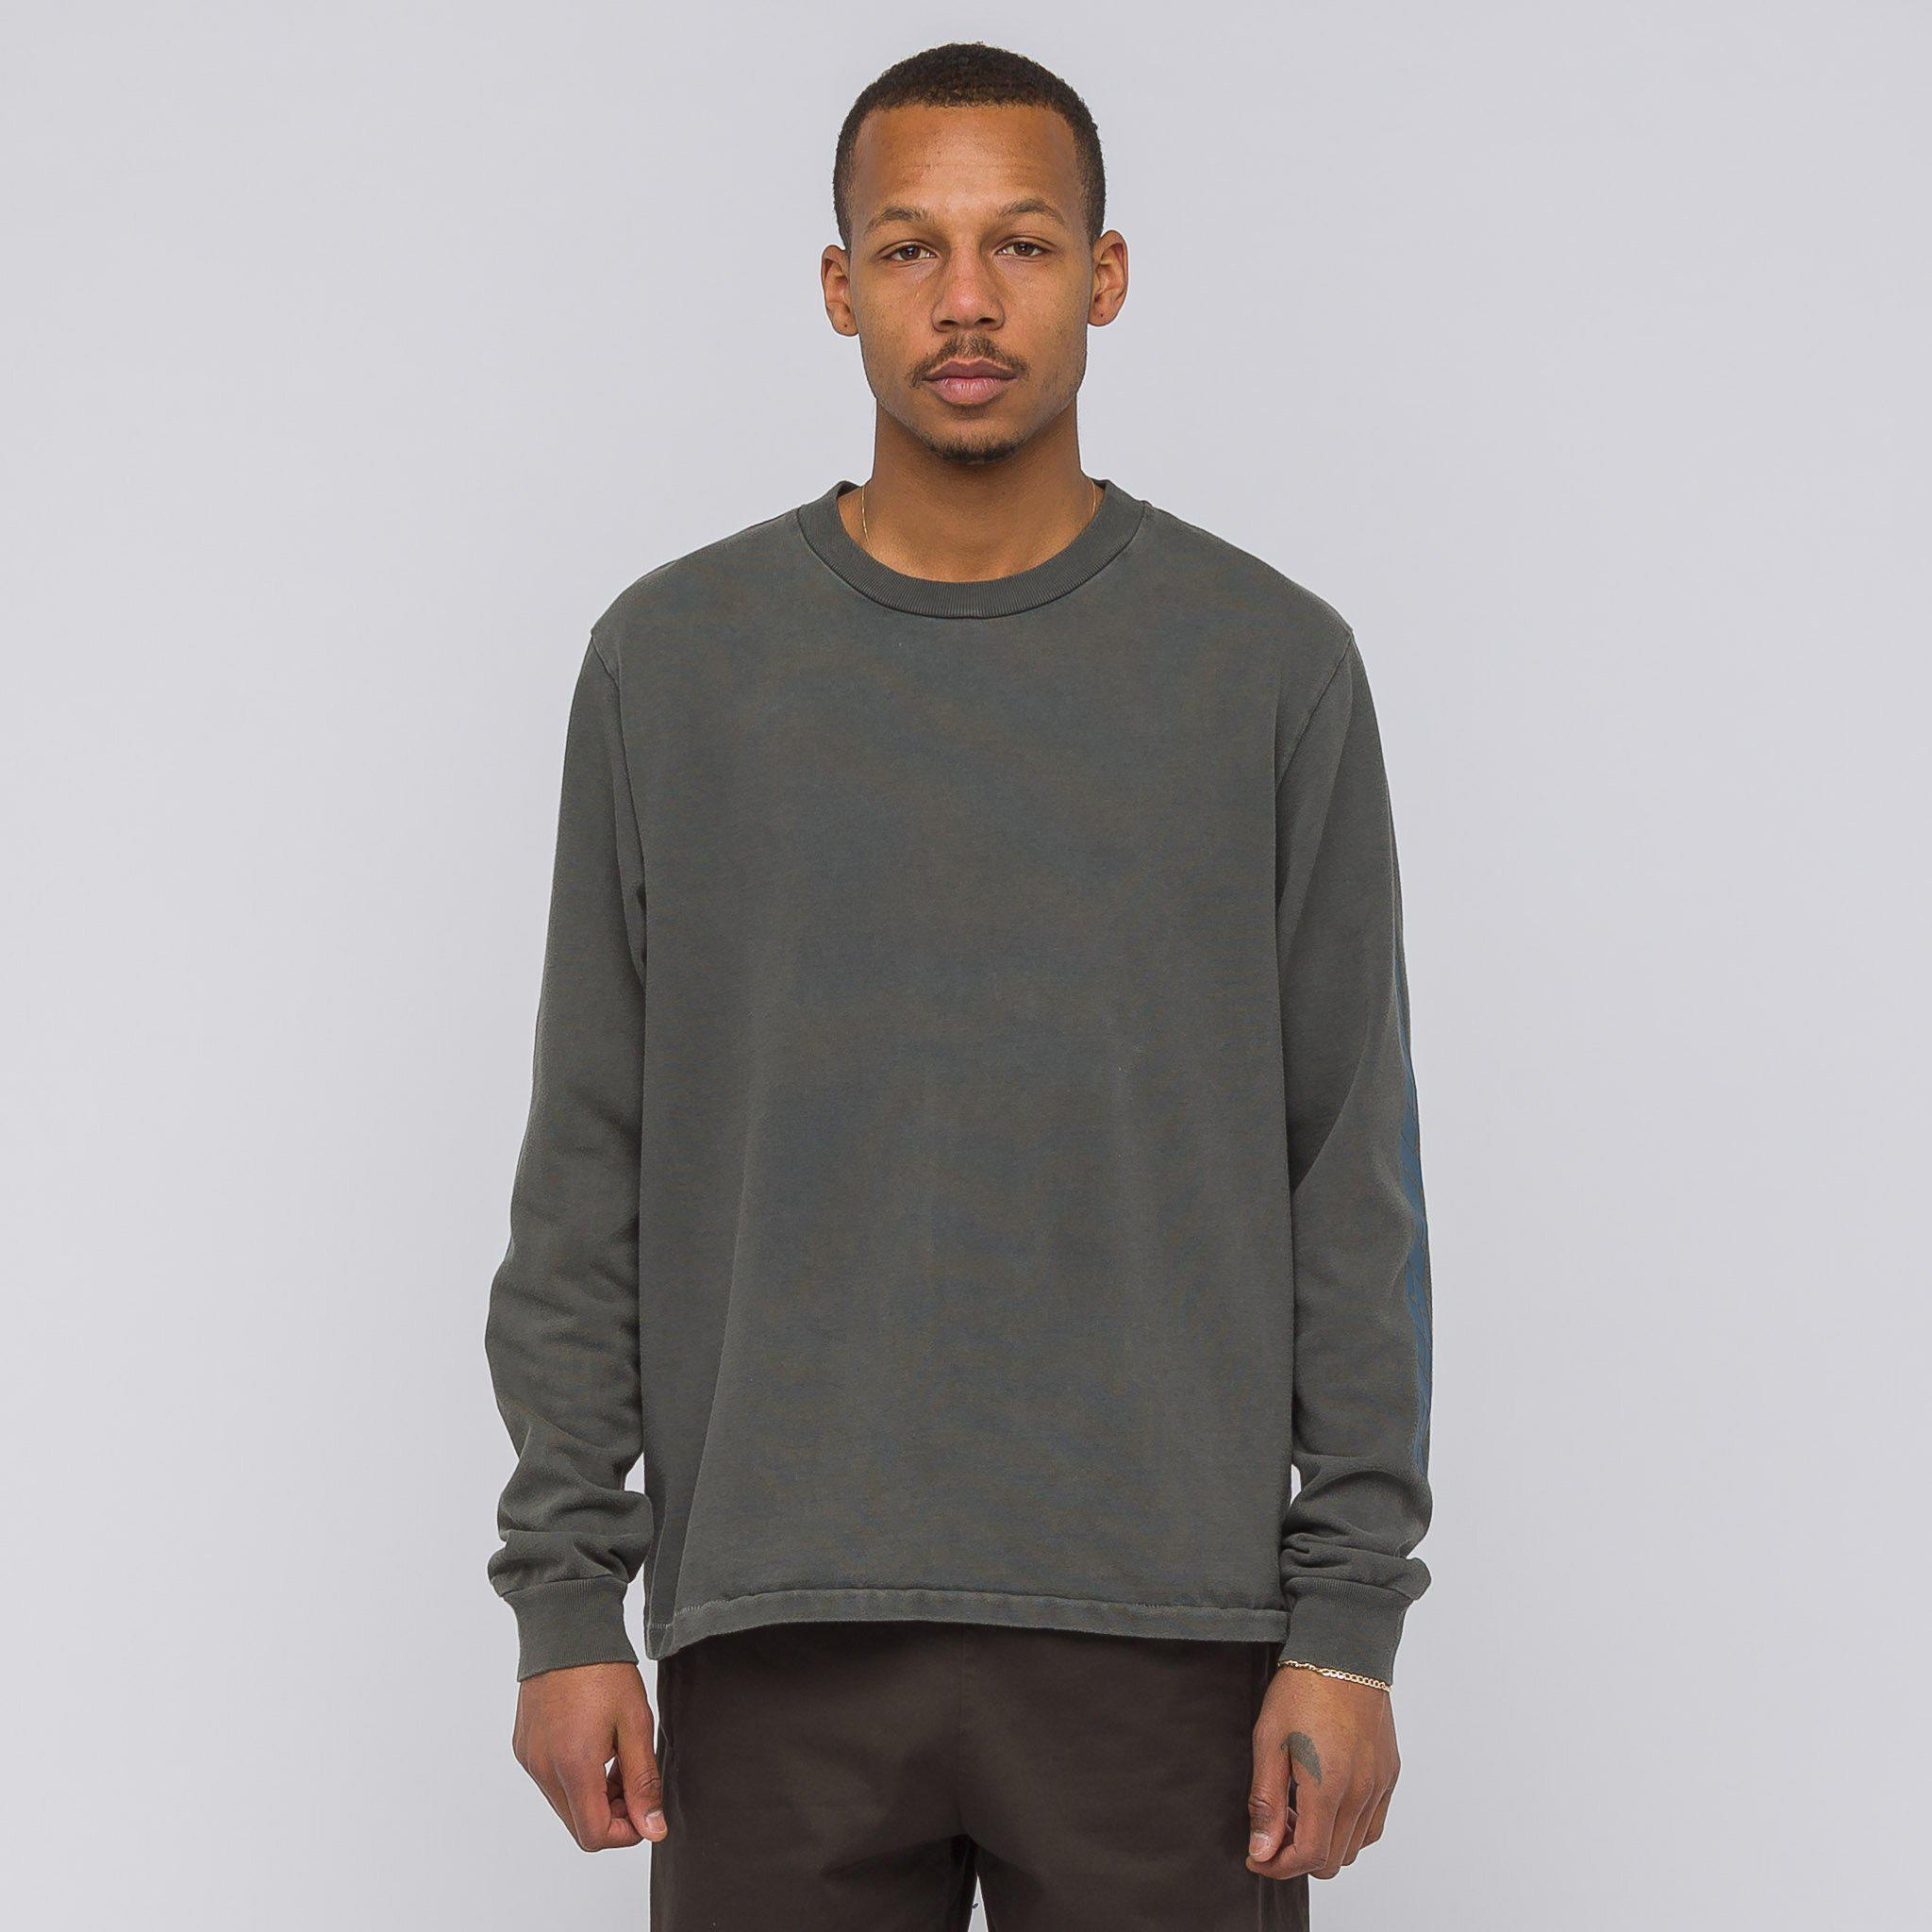 e33b5d3da Lyst - Yeezy Calabasas Long Sleeve T-shirt In Core Indigo in Gray ...